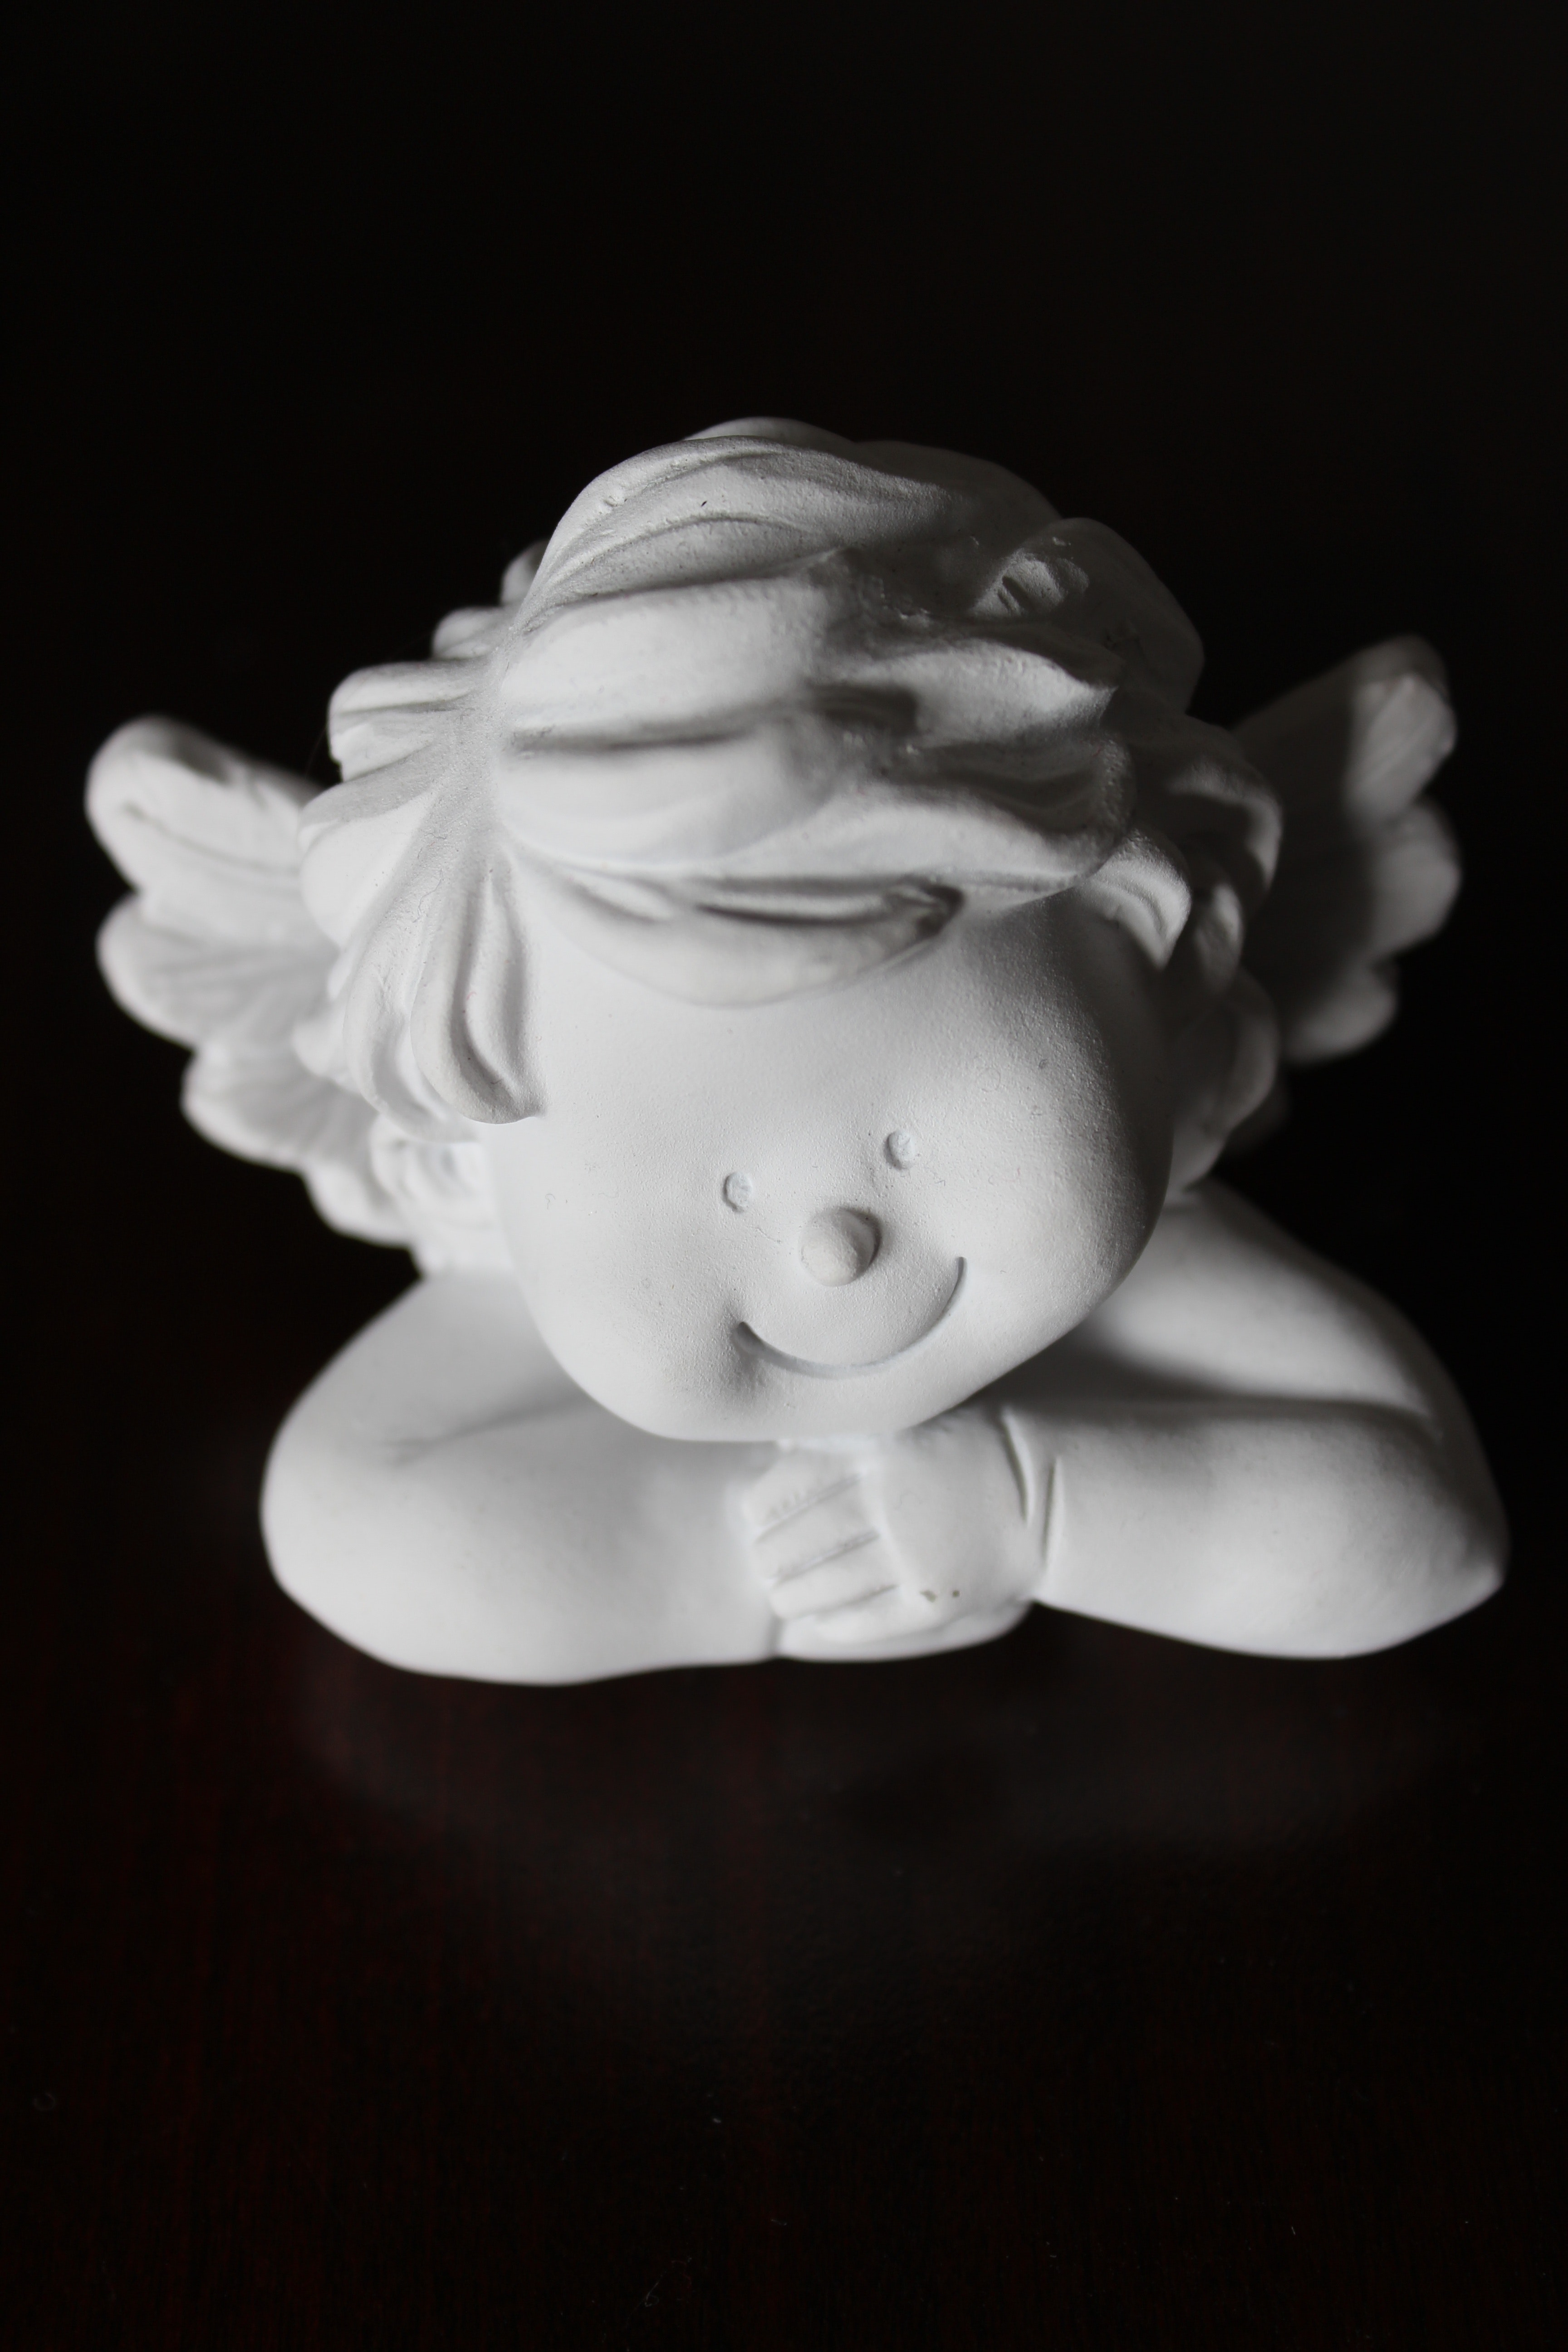 White Angel Figurine, Religious, Sculpture, Religion, Porcelain, HQ Photo